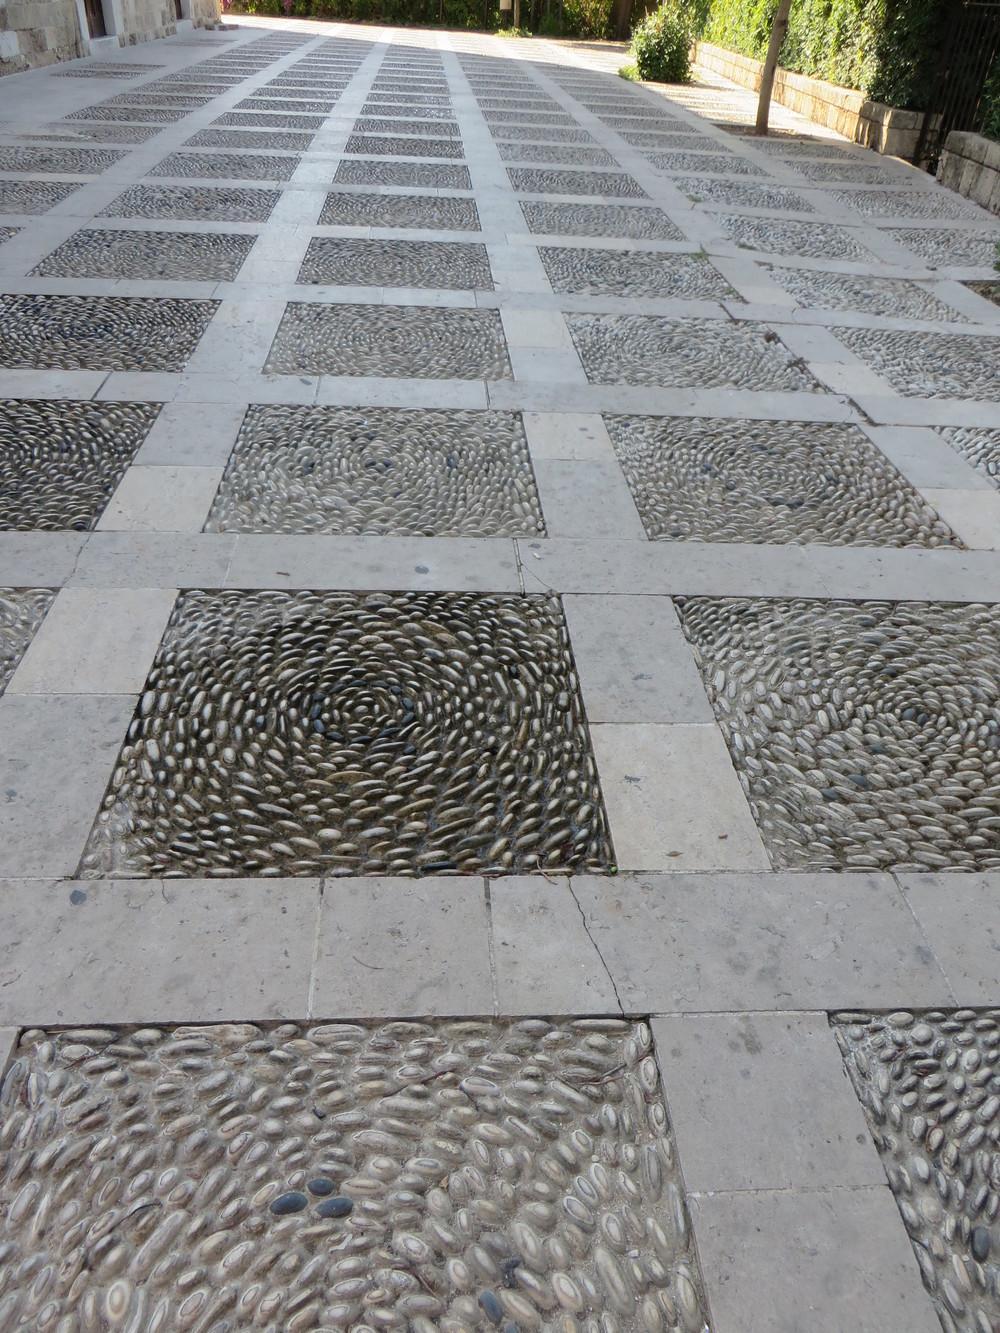 Byblos paving